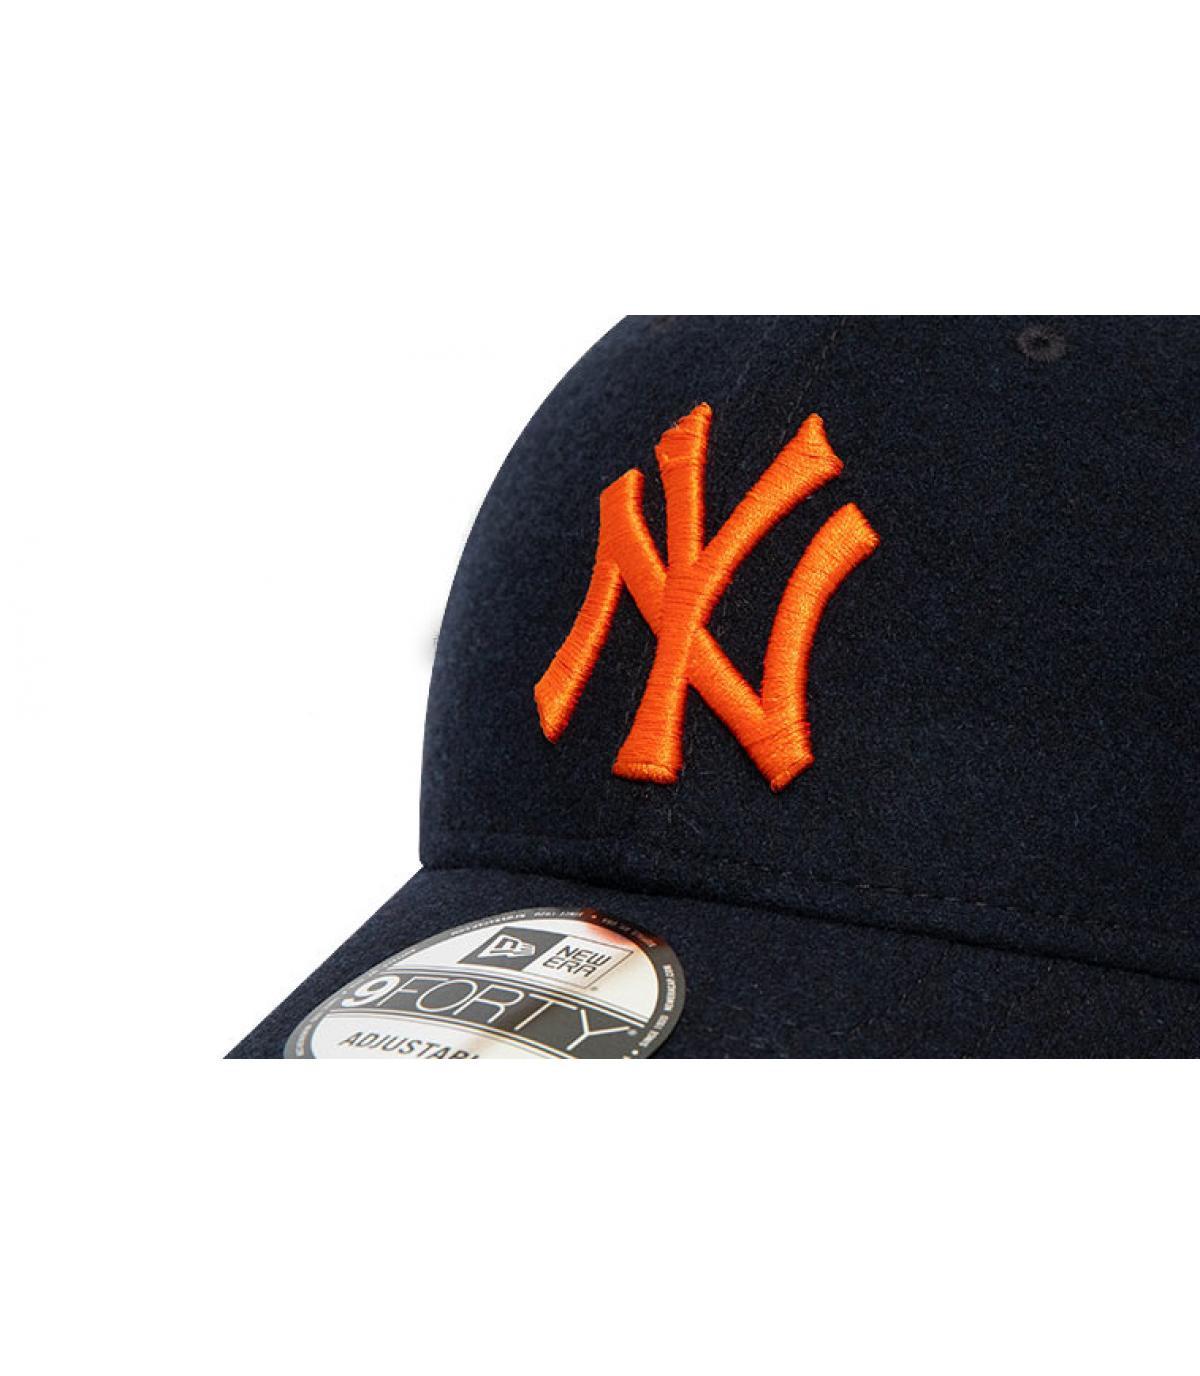 Details Cap Kids League Ess NY 940 black orange - Abbildung 3